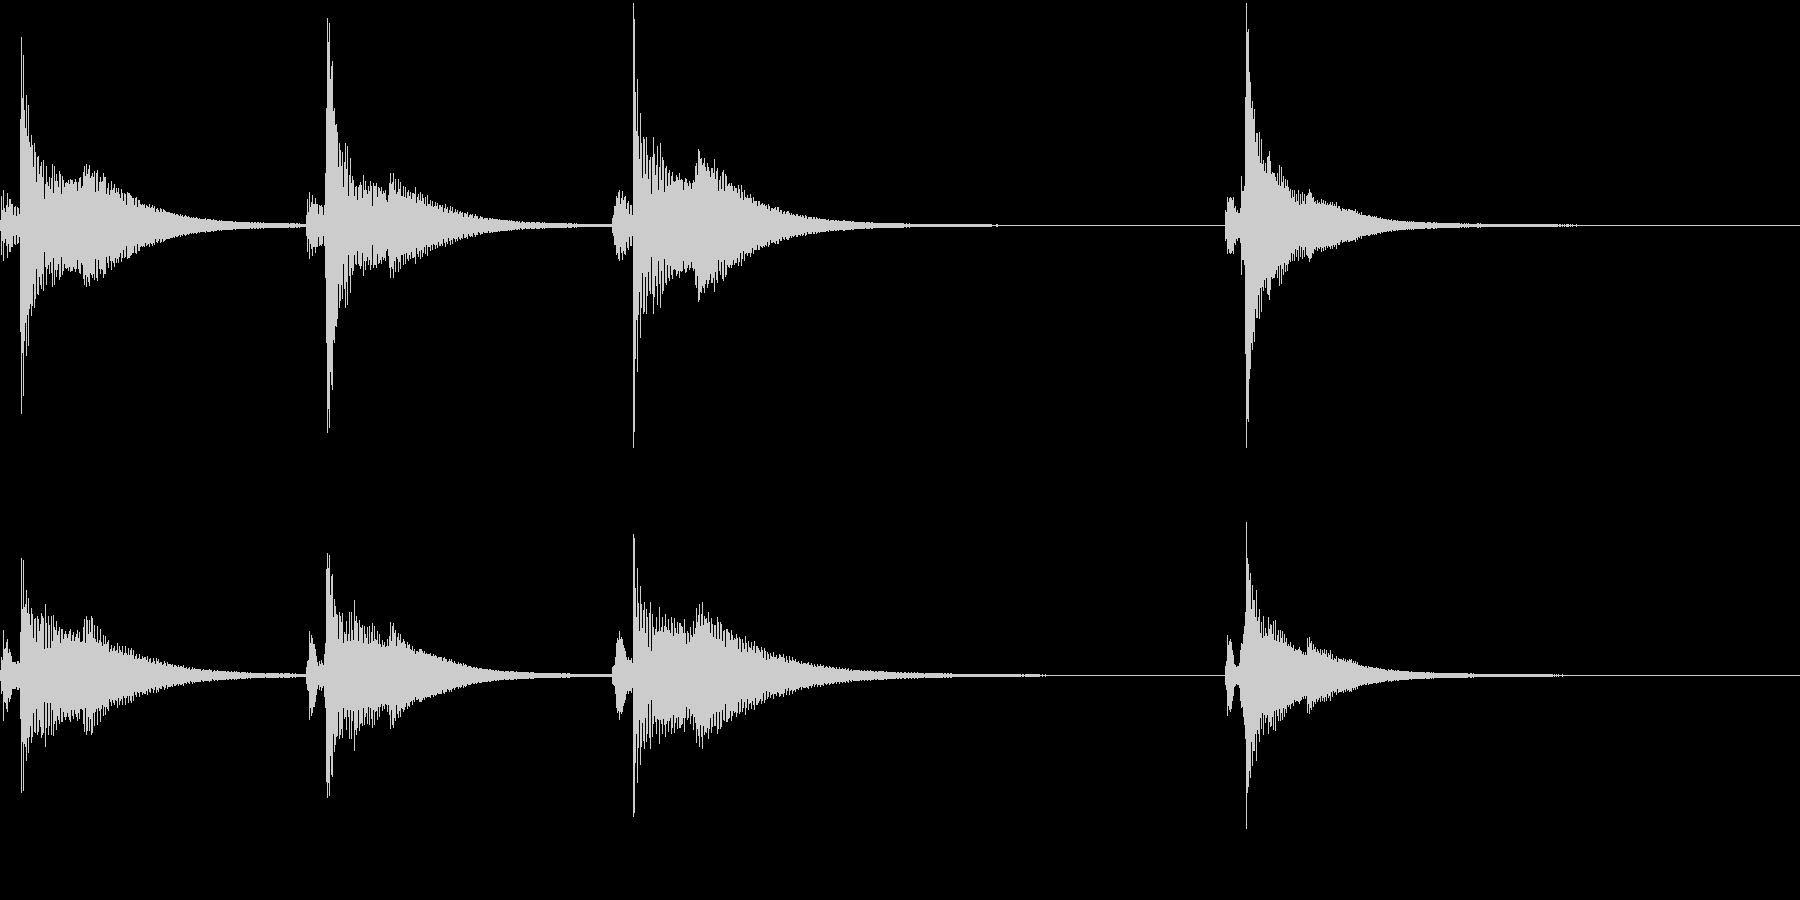 Kawaii メルヘンな受信・通知音 4の未再生の波形